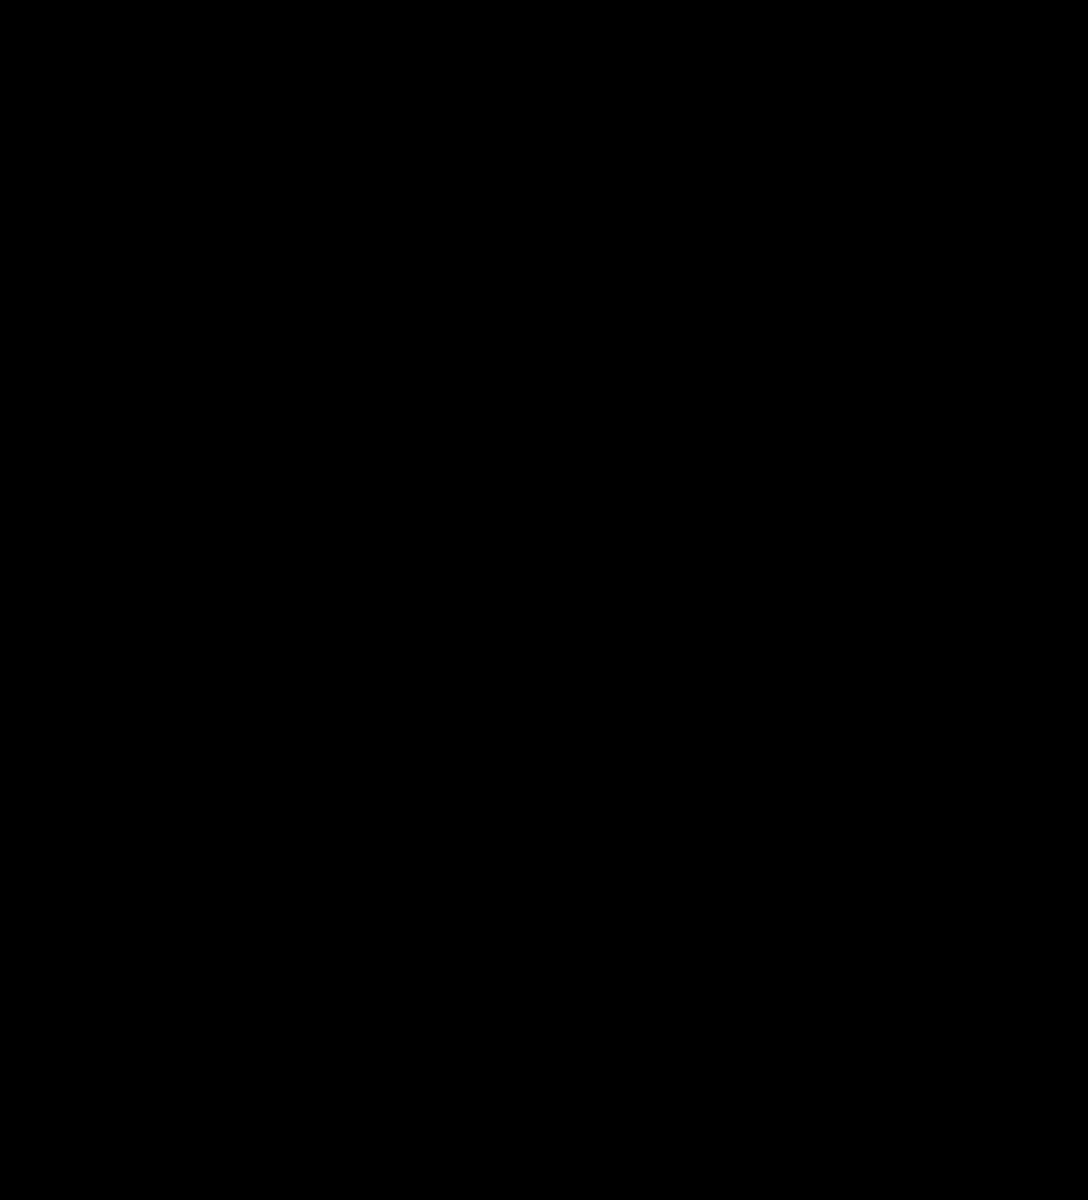 Poster Kaart Europa met Kraslaag – Multi – 65×43 cm – Scratch Map Europa mét 50 vlaggen – Meest gedetailleerde Kras Map Europa inclusief vergrootglas en krasser – Kraskaart Europa